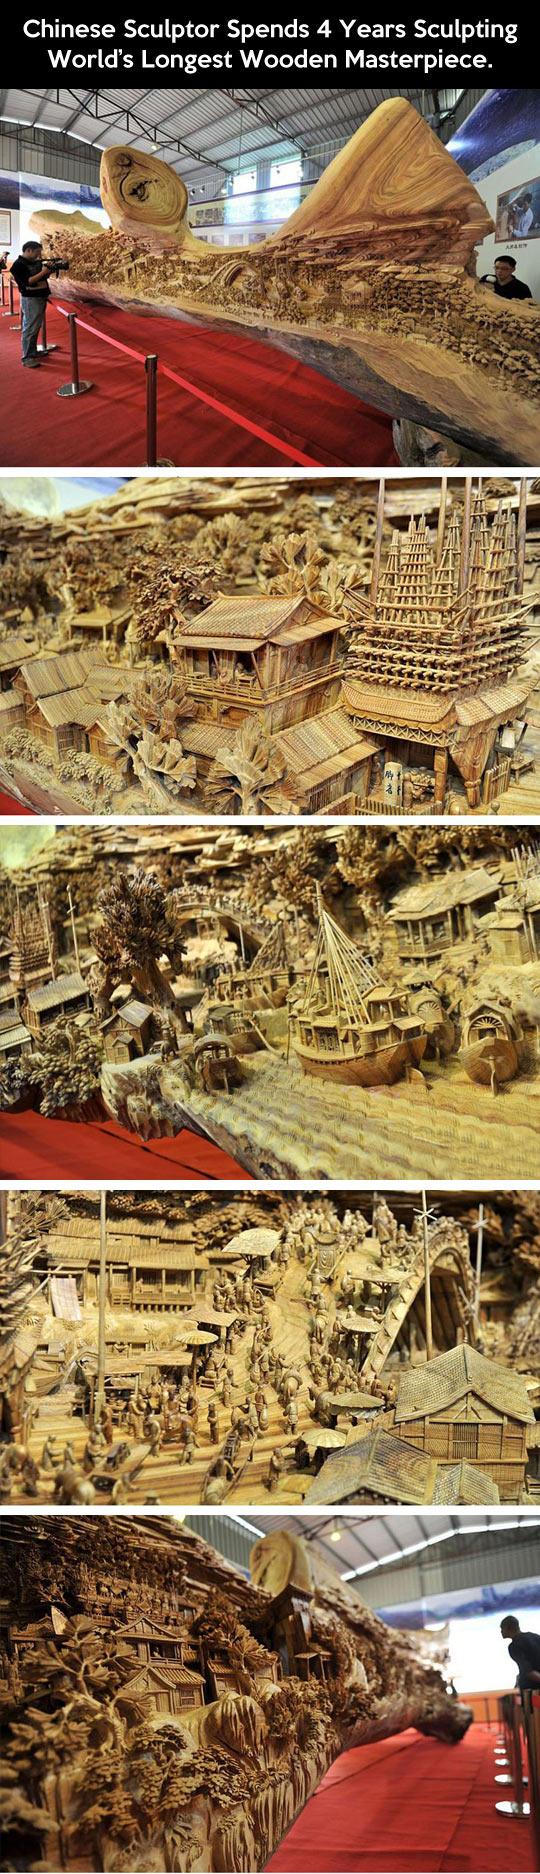 World's longest wooden masterpiece…